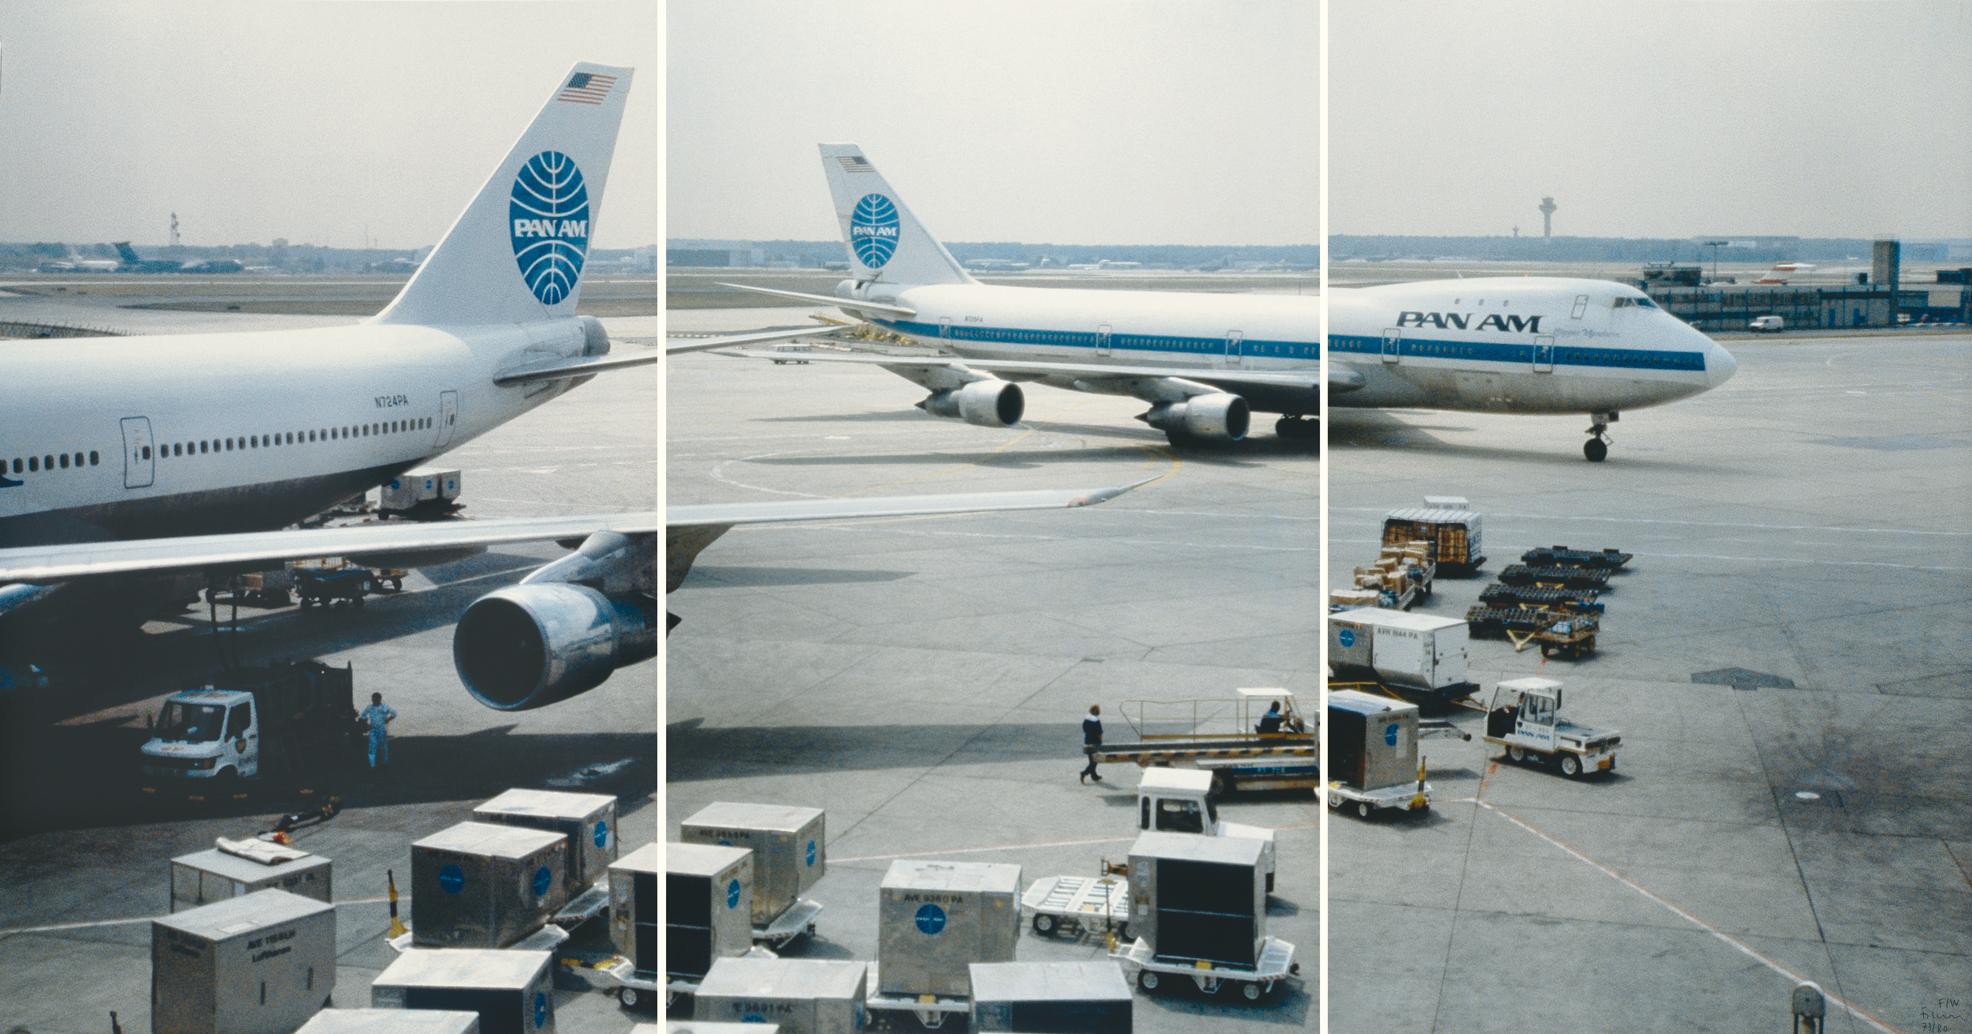 Fischli Peter, Folder. Triptych - Airport, 1987